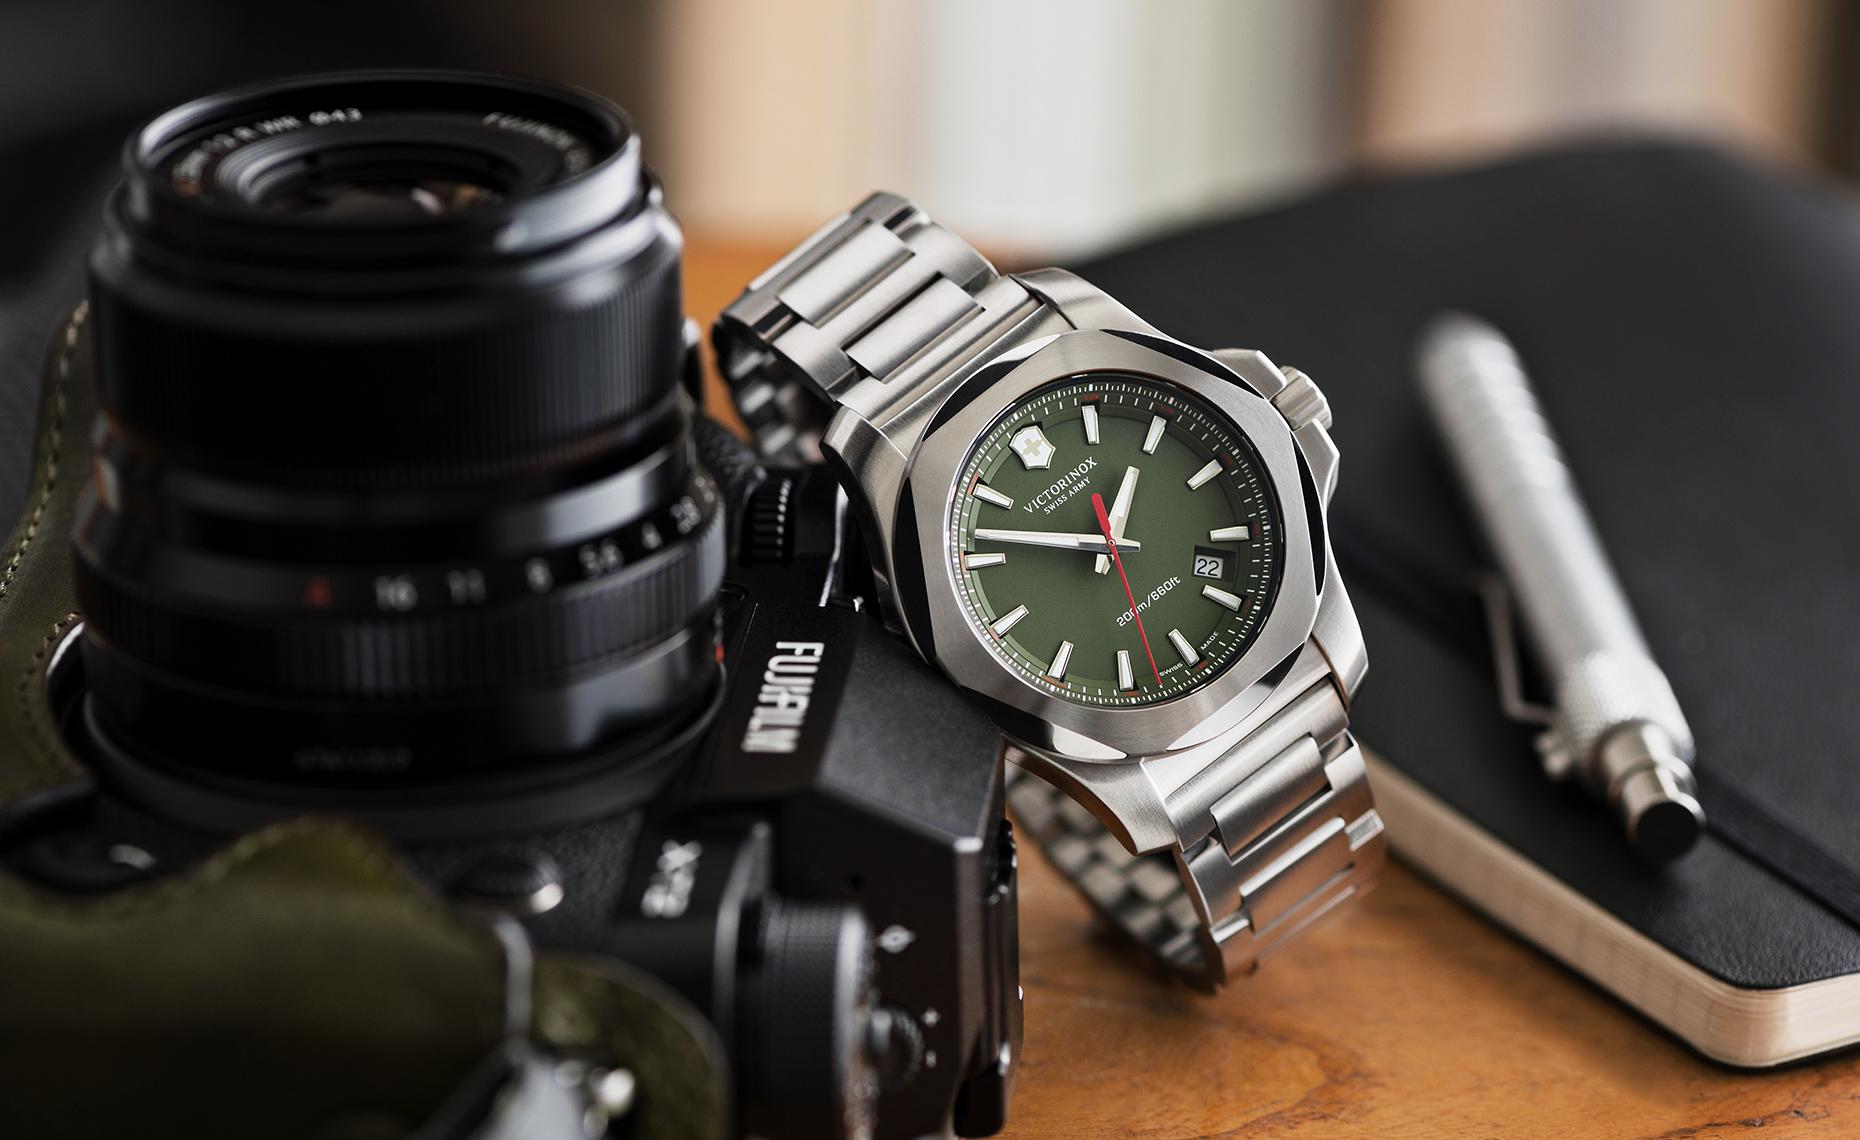 tom-medvedich-still-life-jewelry-watches-victorinox-inox-green-01.jpg